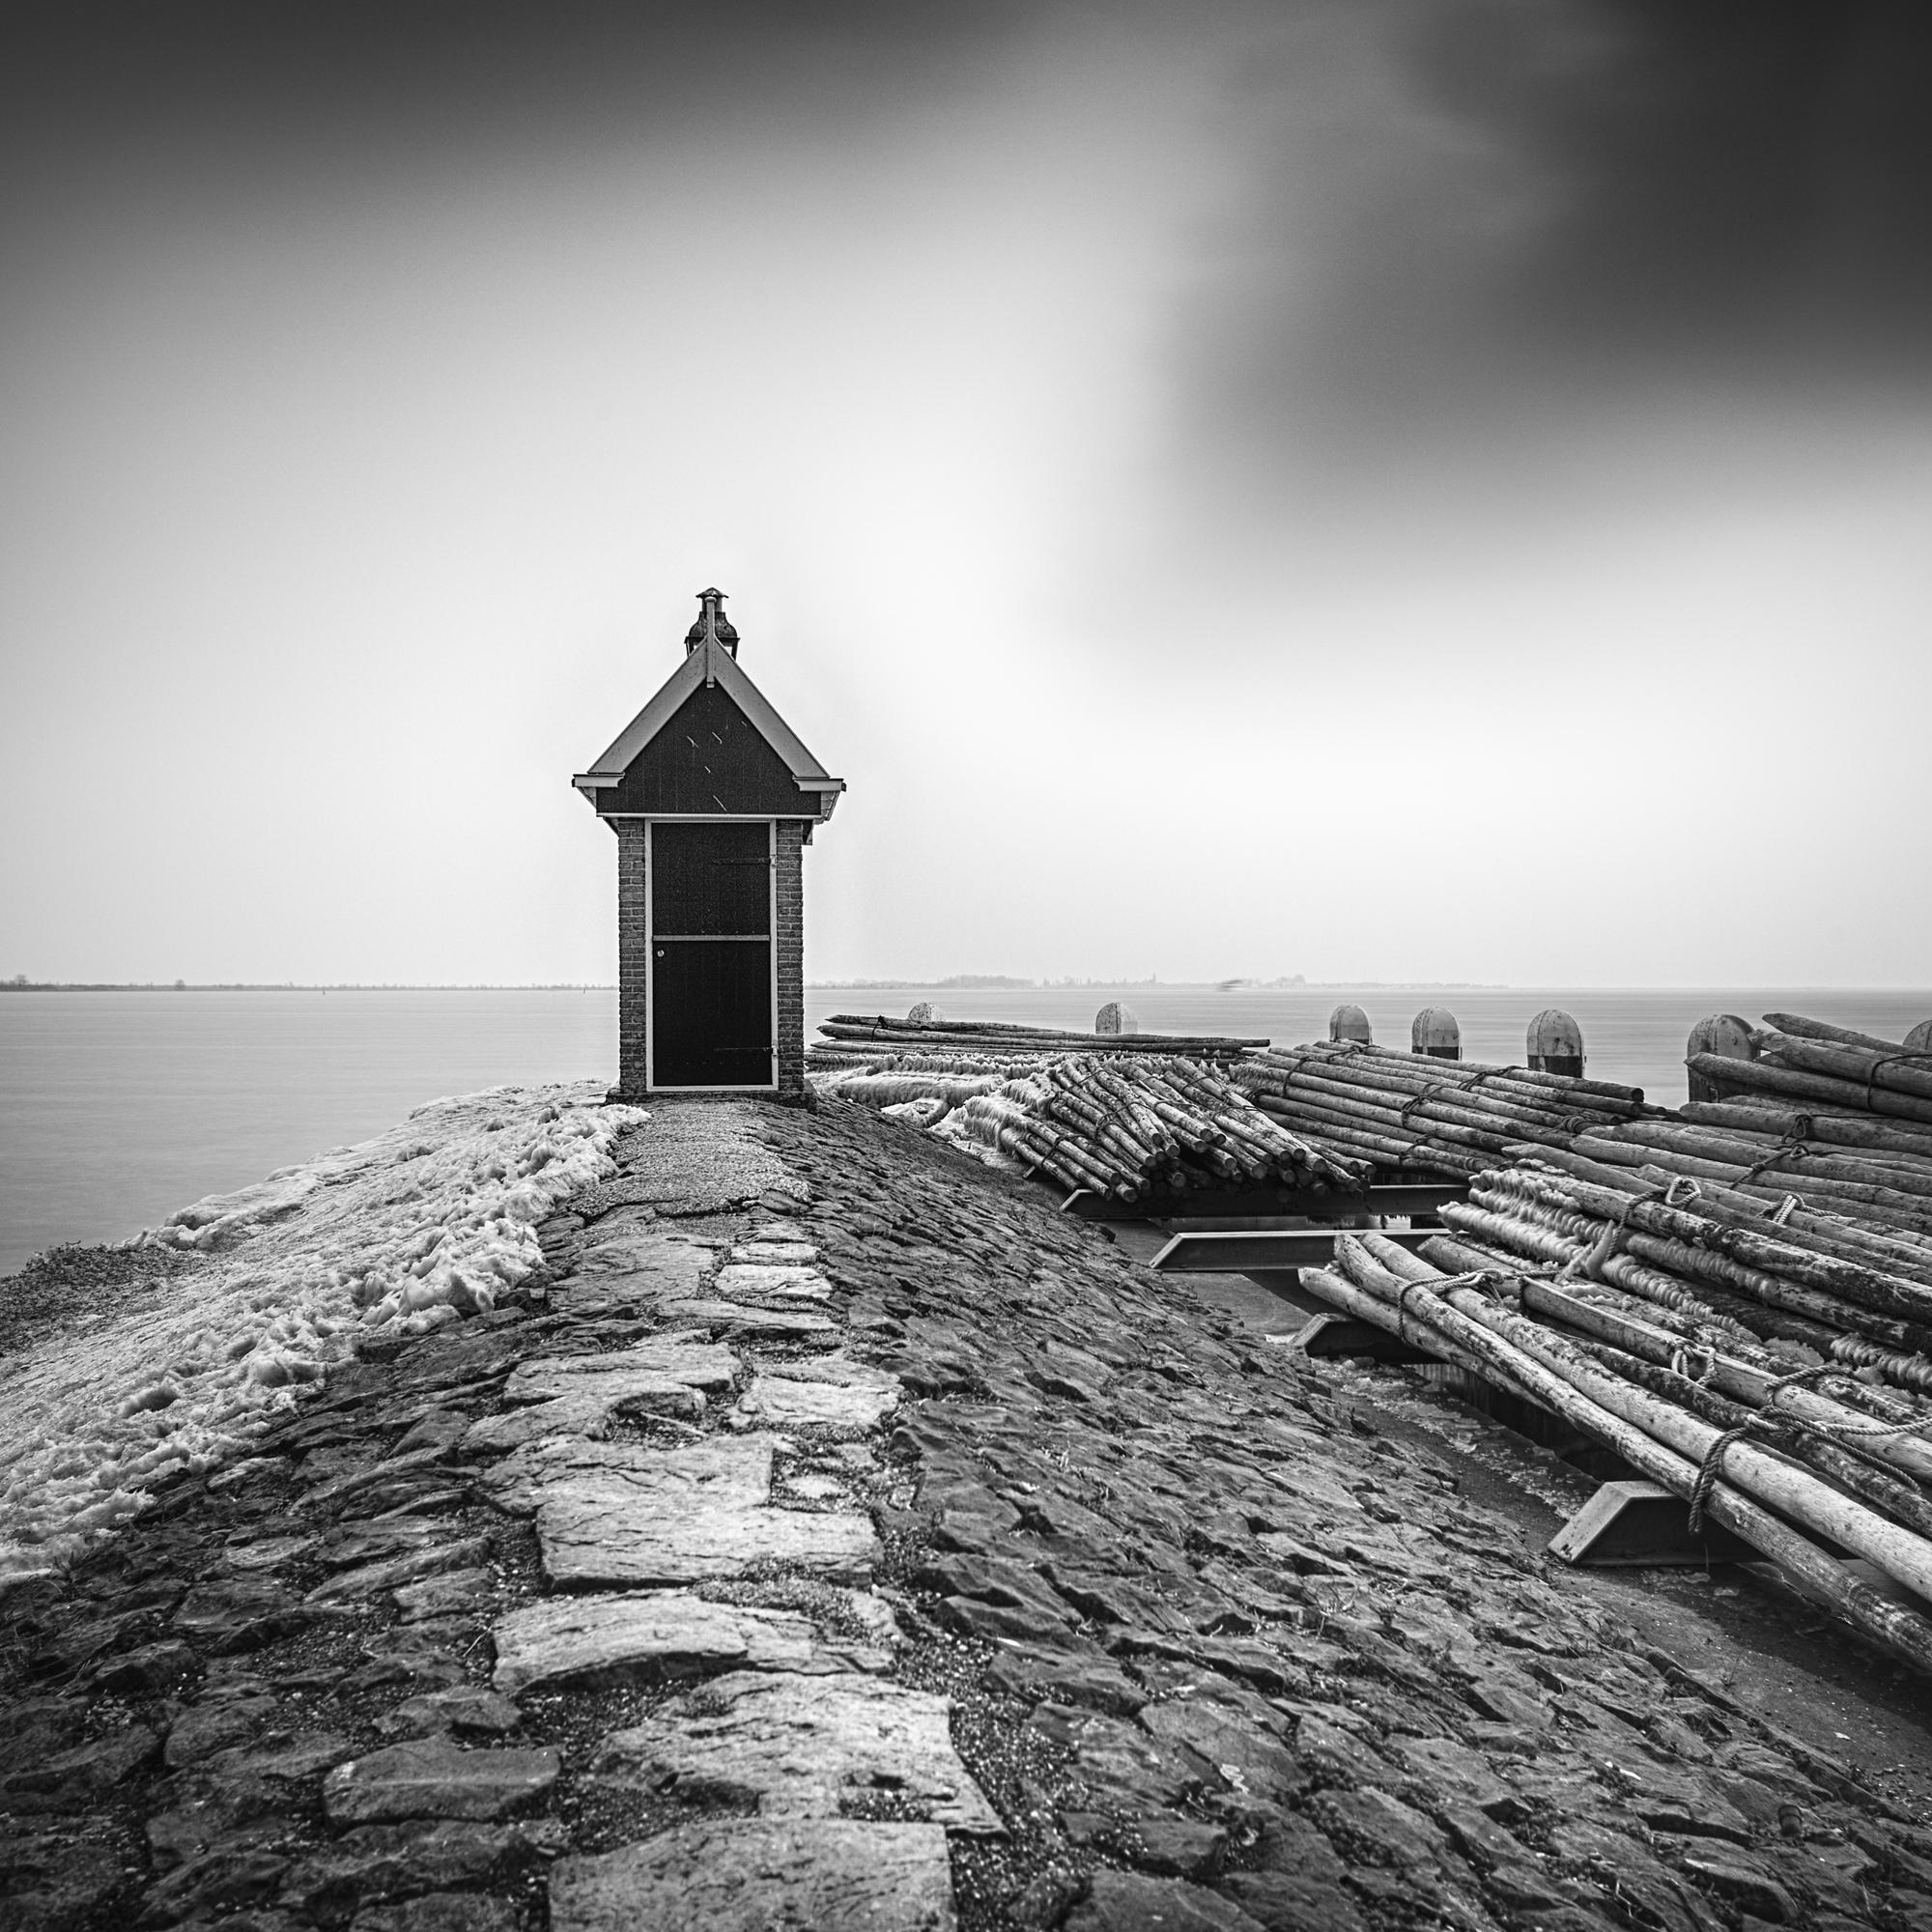 Volendam-Harbor-HDR-BW.jpg